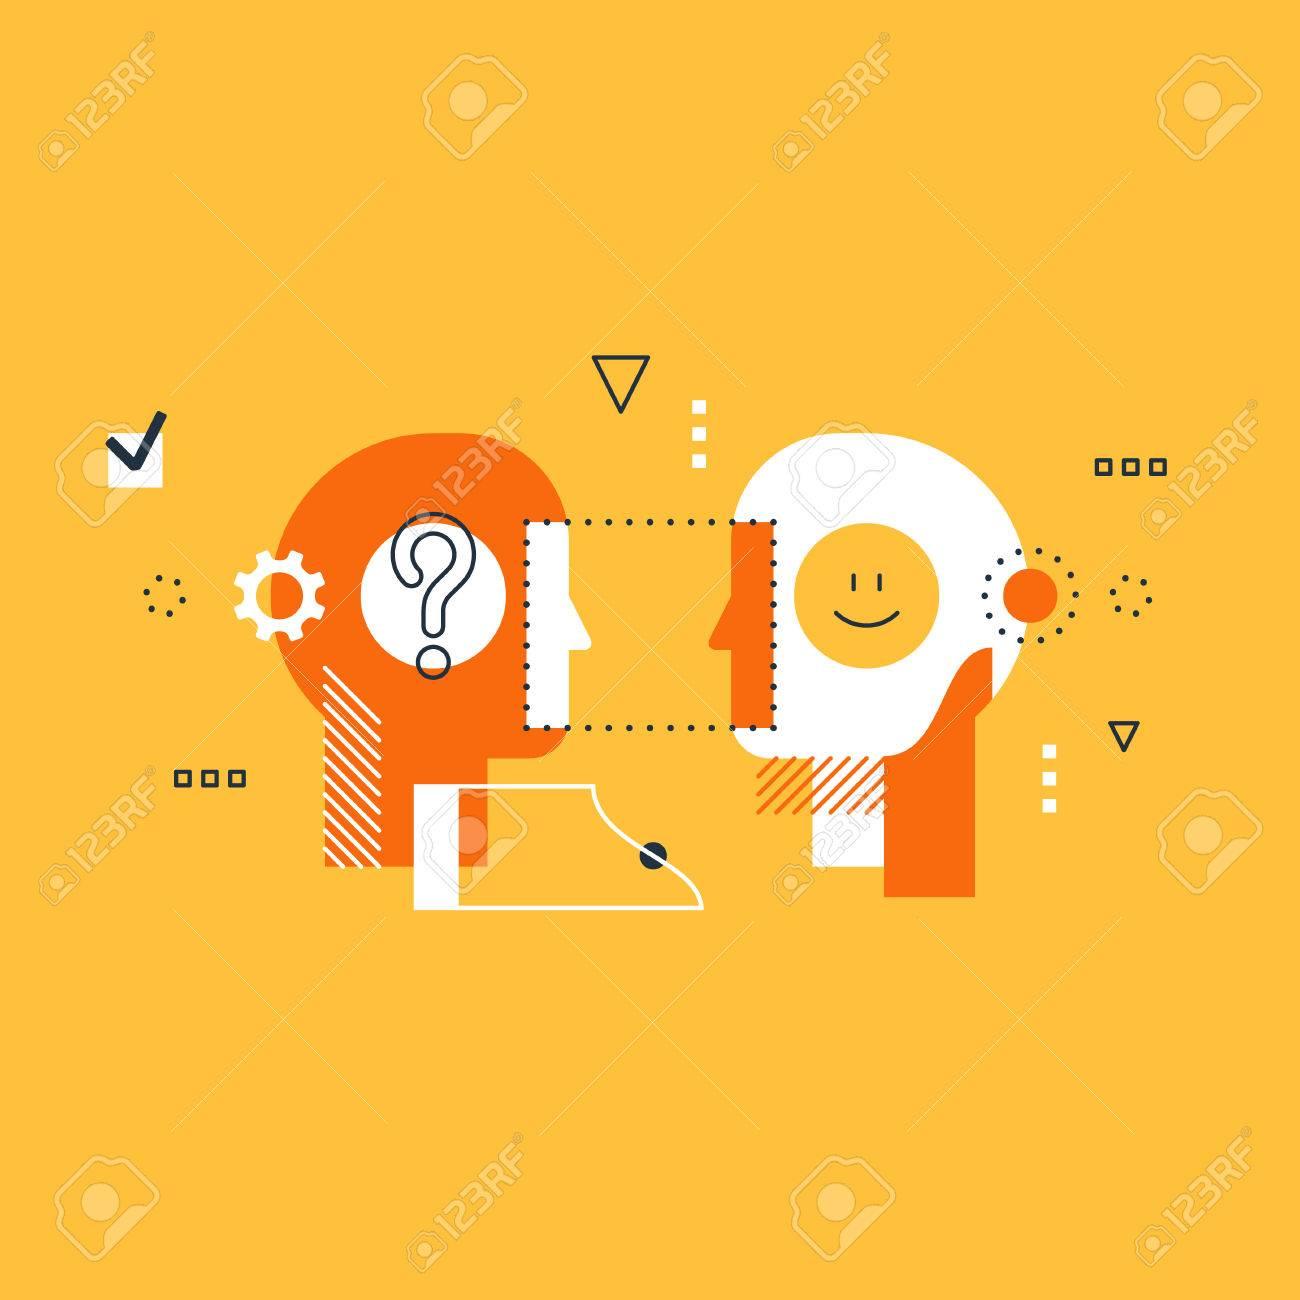 Psychology education concept, flat design illustration on white background - 68477706